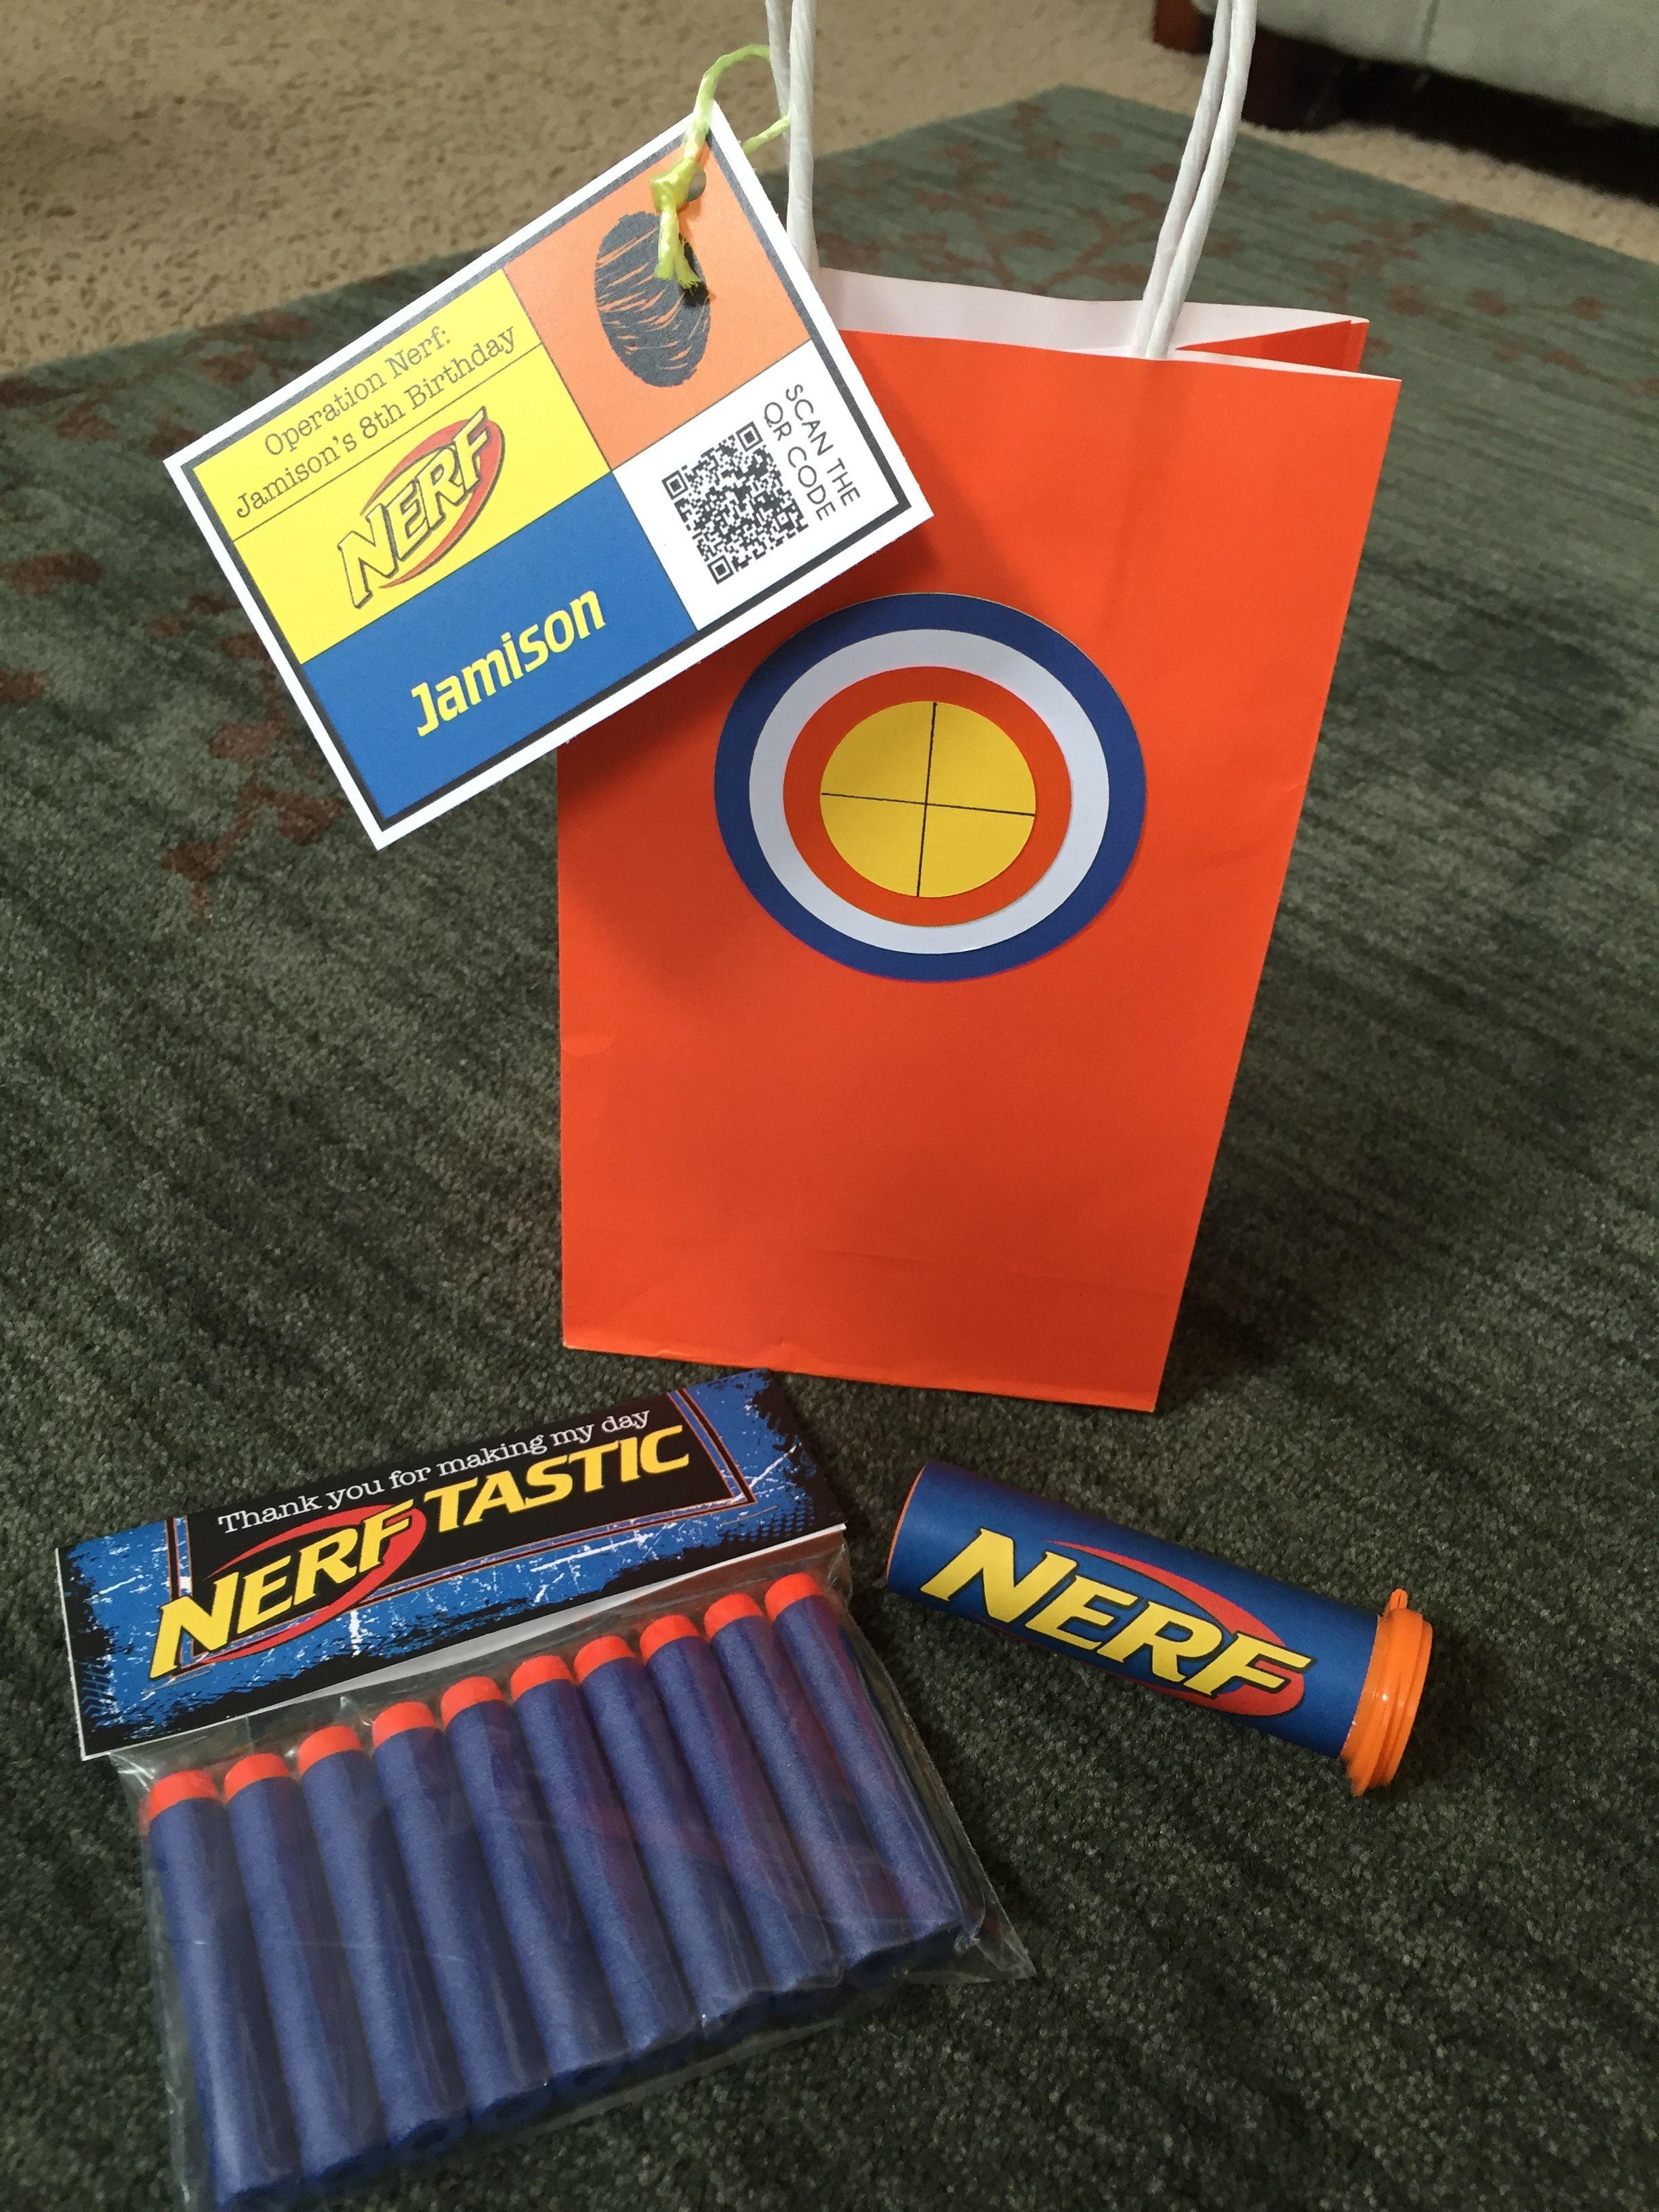 11DIY Cereal Box Nerf Gun Target Templates Click to Make It